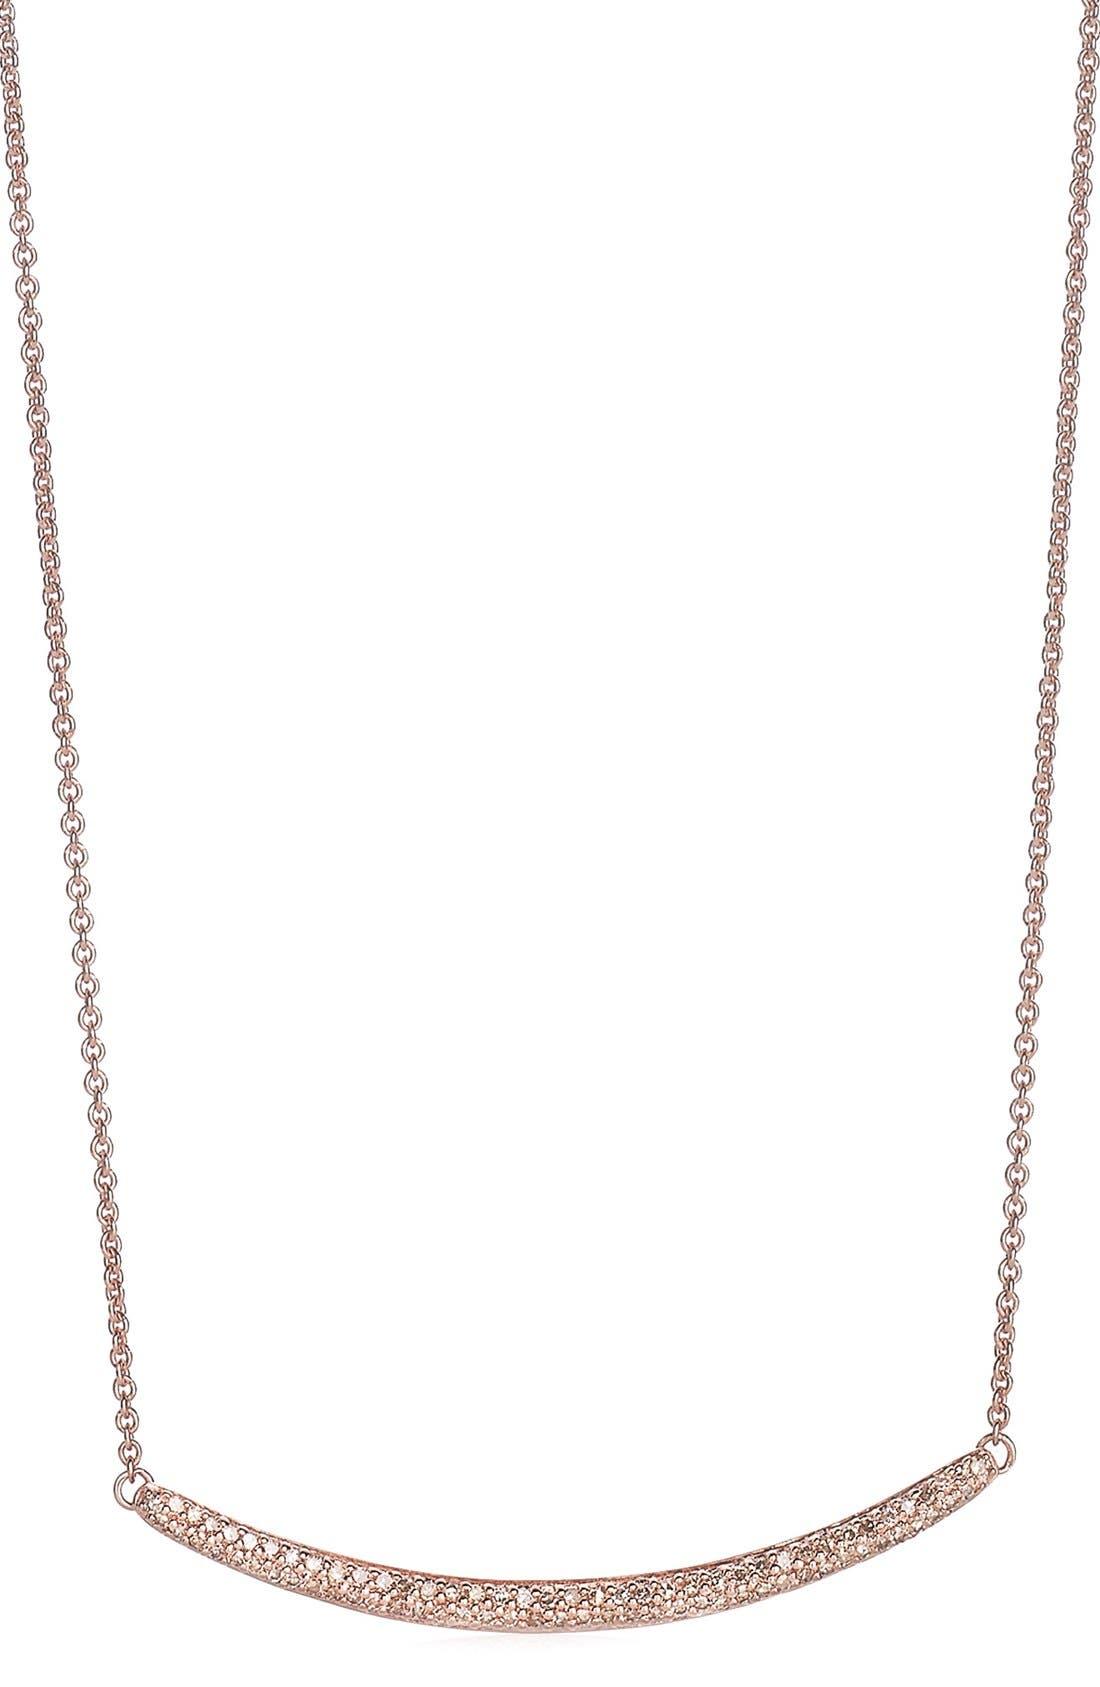 Monica Vinader 'Skinny' Diamond Necklace